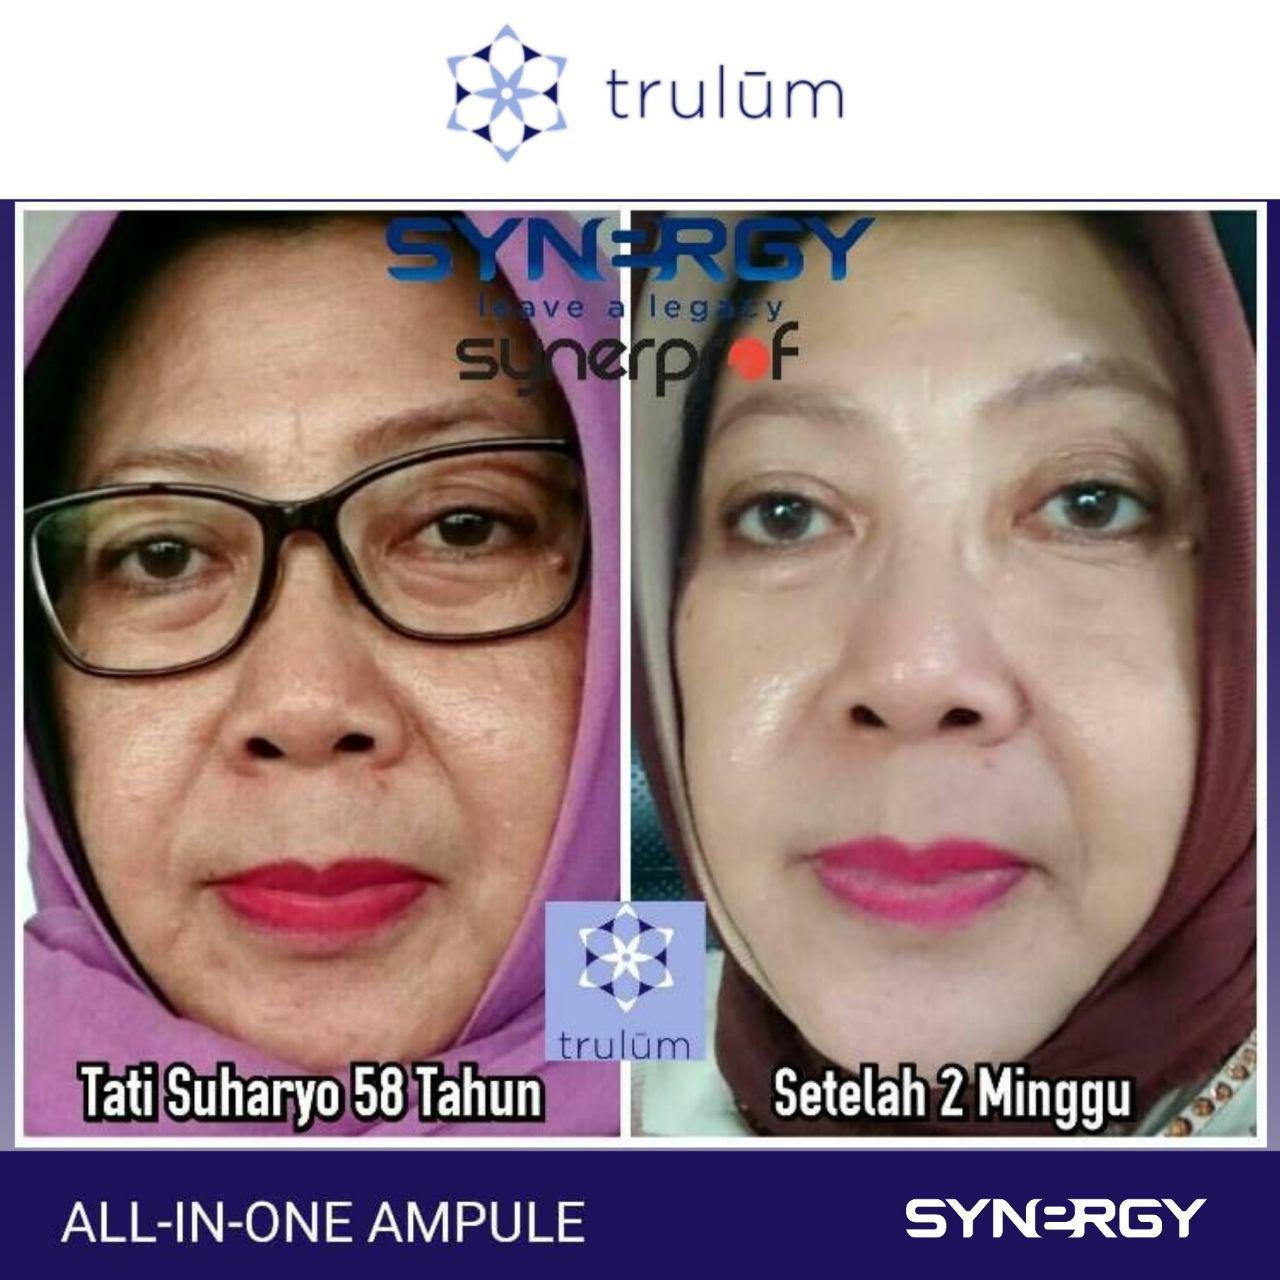 Klinik estetika Trulum Dari Synergy Di Cicurug